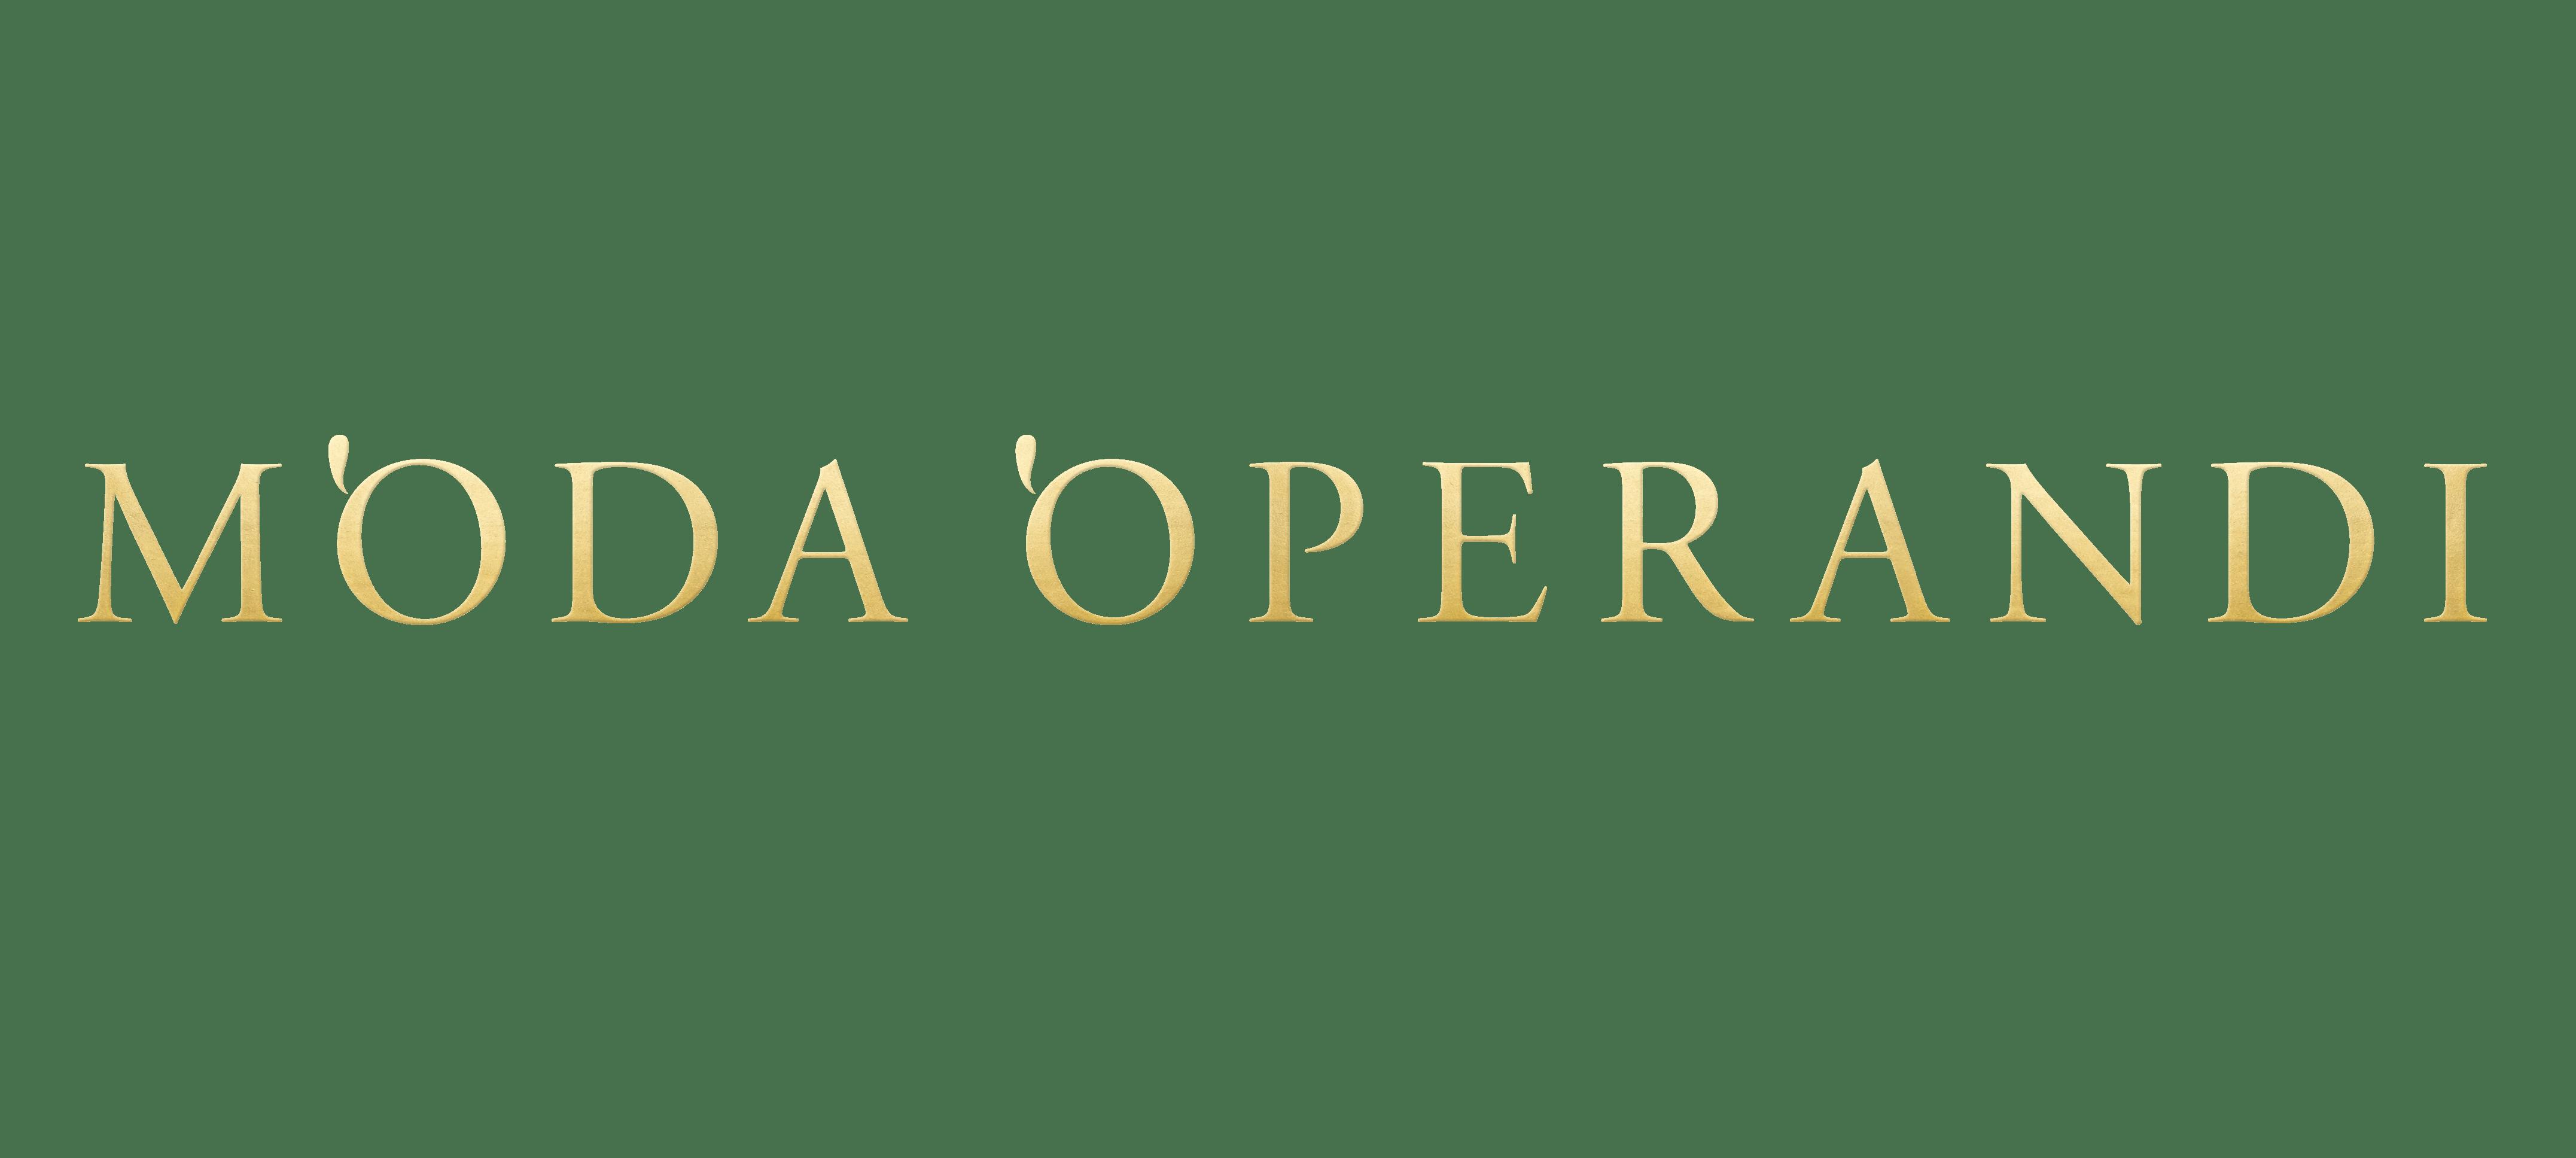 modaoperandi logo